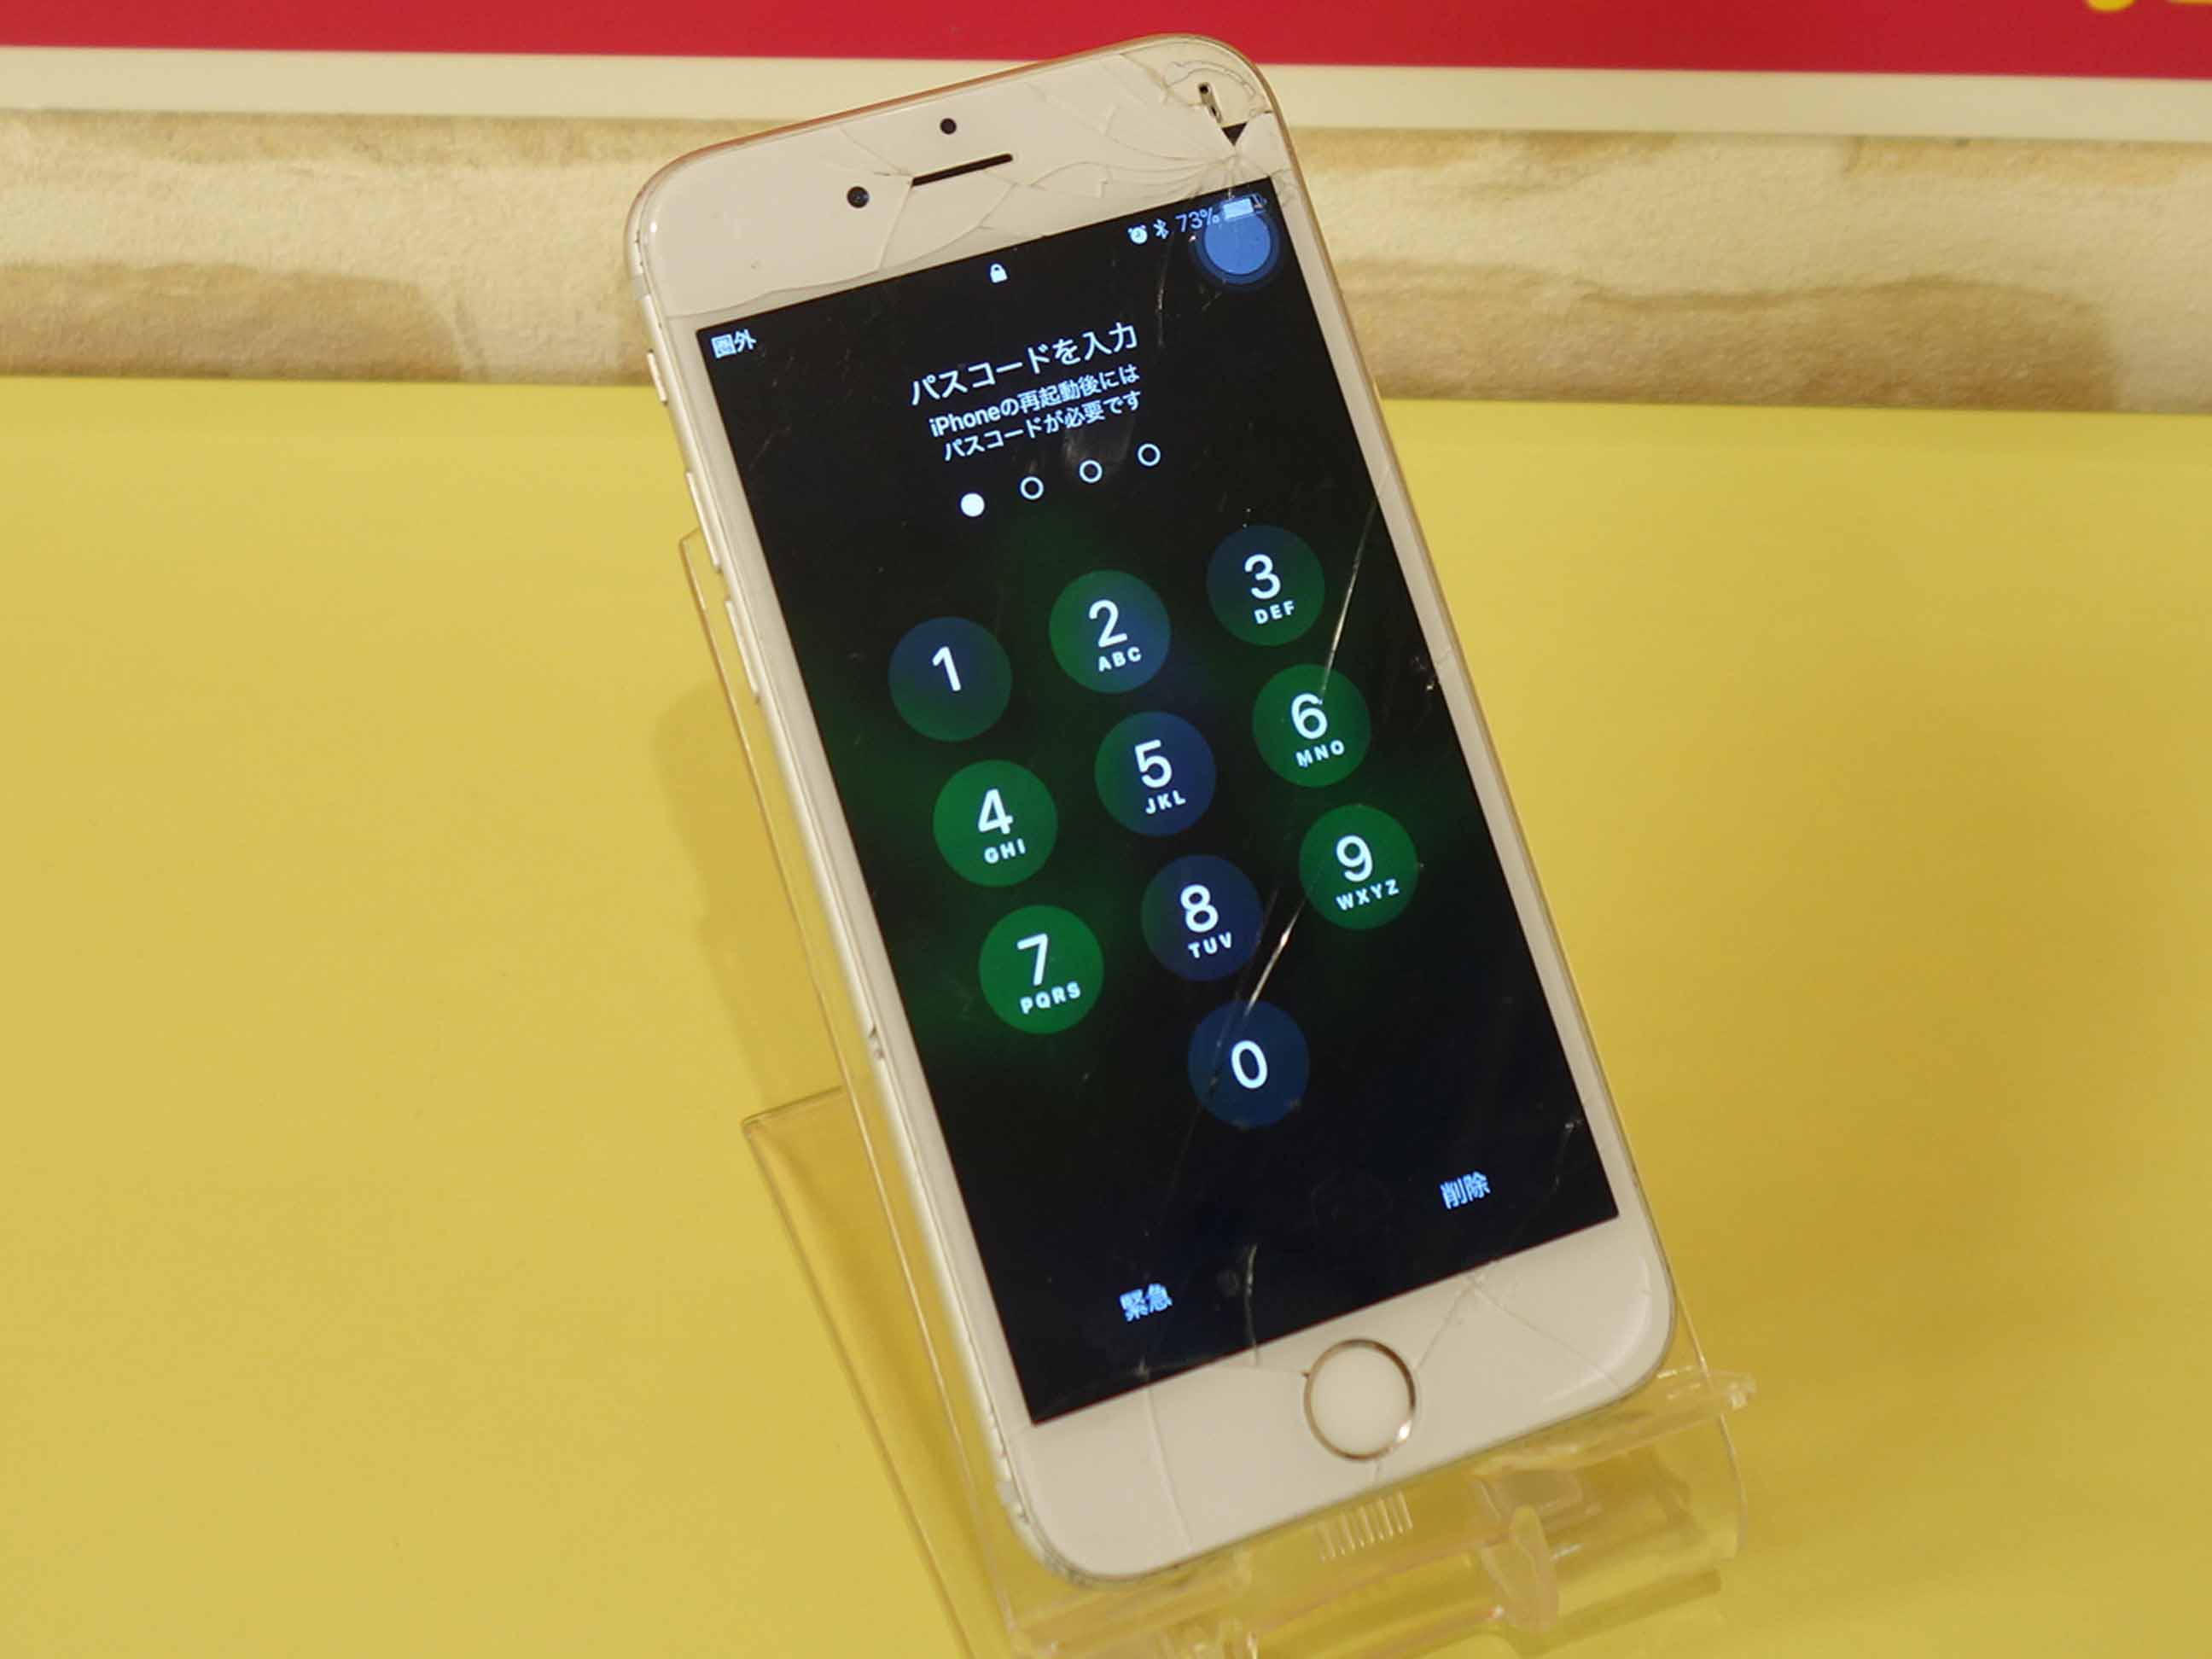 iPhone6sの液晶交換修理であま市からご来店 アイフォン修理のクイック名古屋